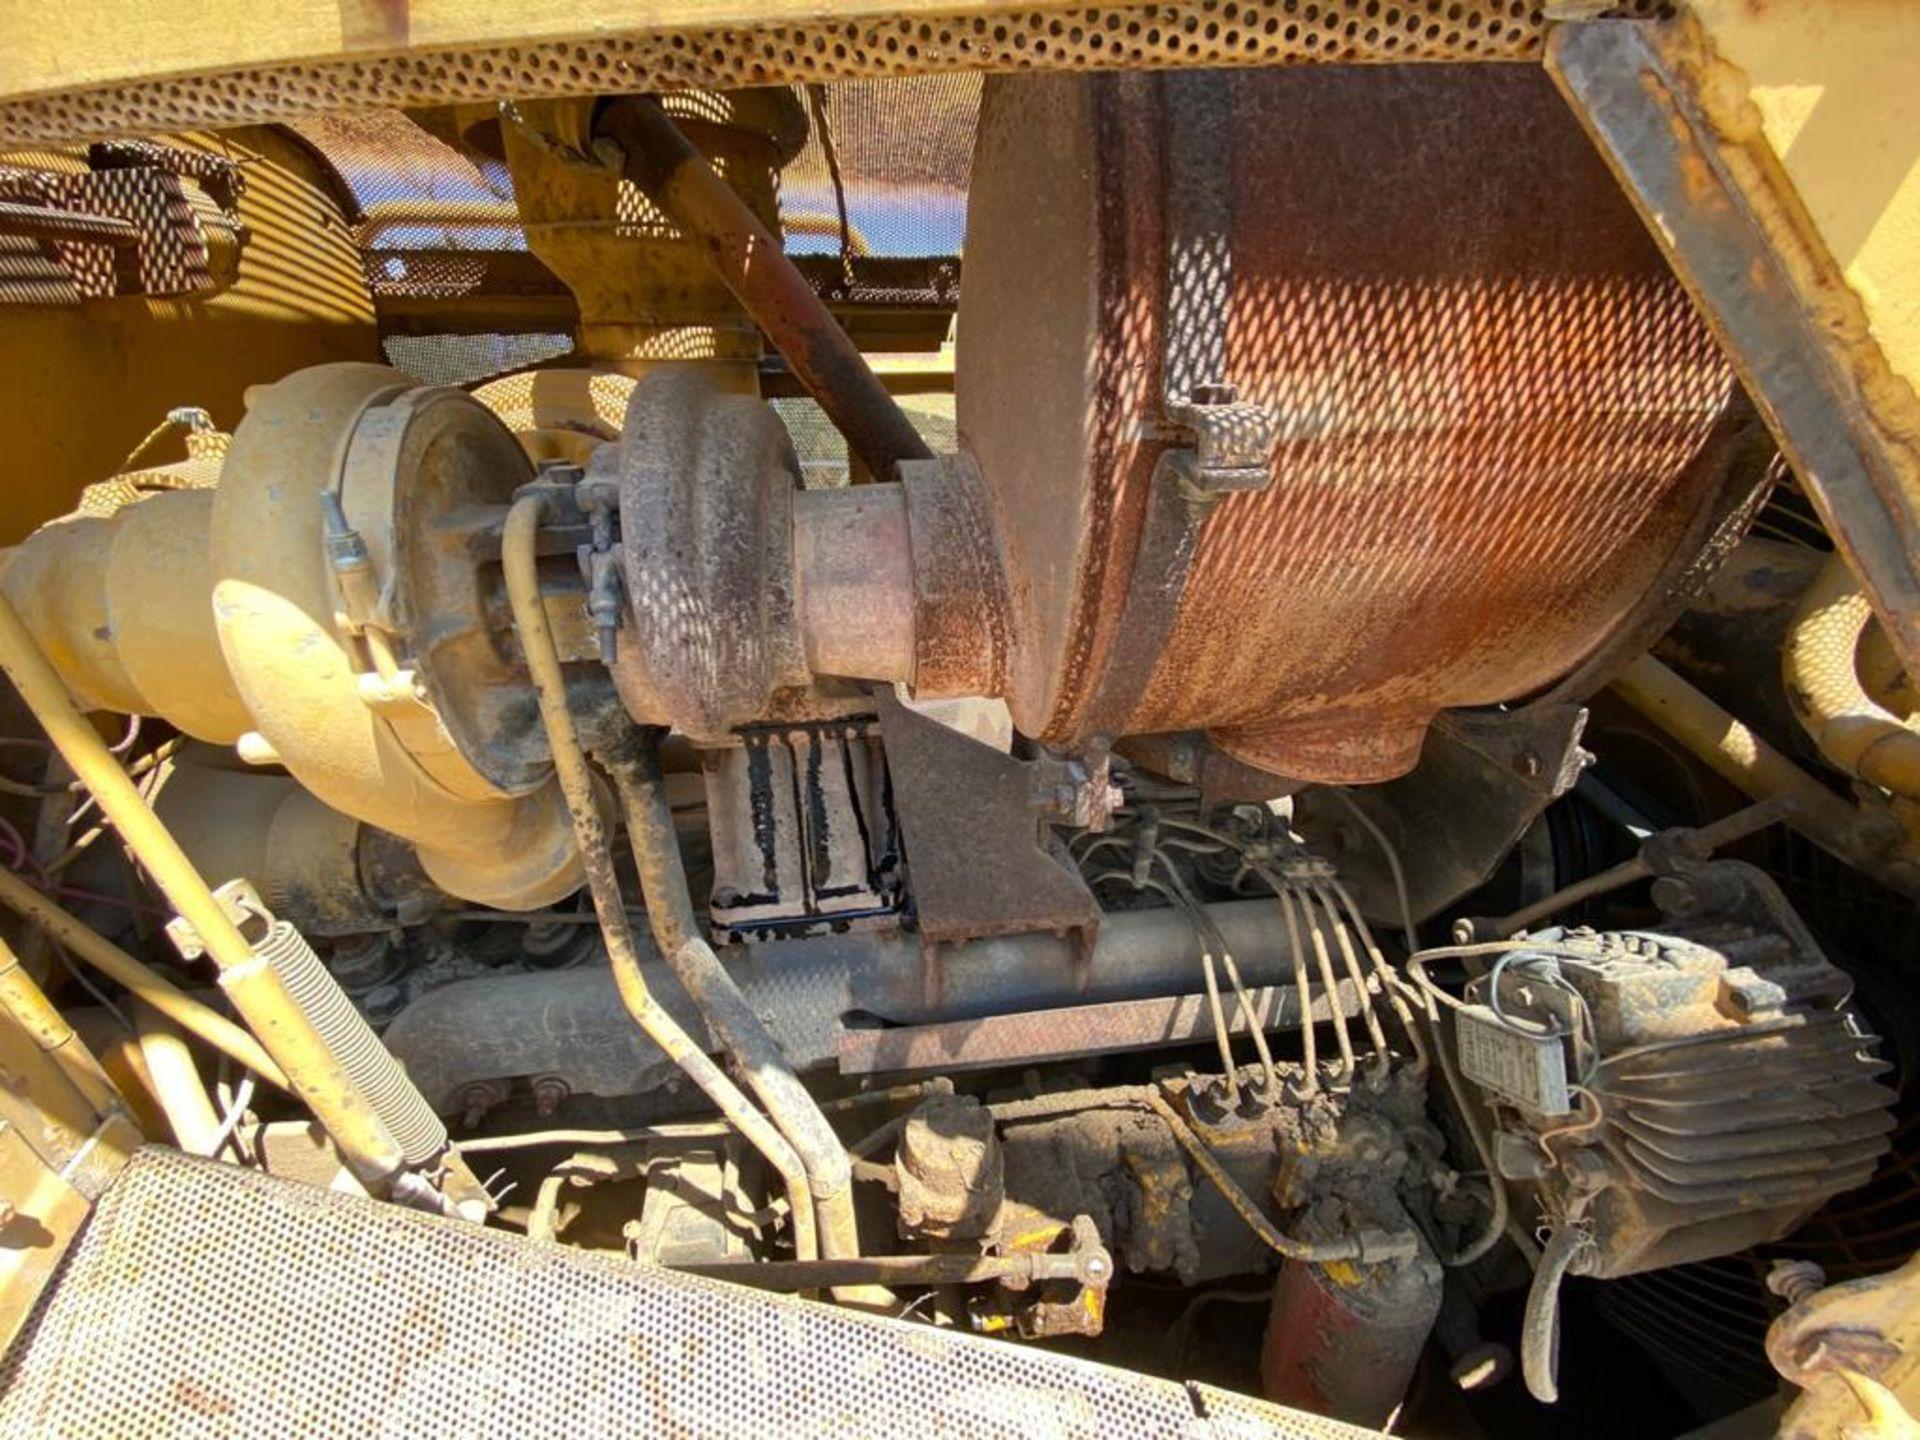 Caterpillar D7G Bulldozer, Serial number 92V5897, Diesel motor - Image 40 of 48